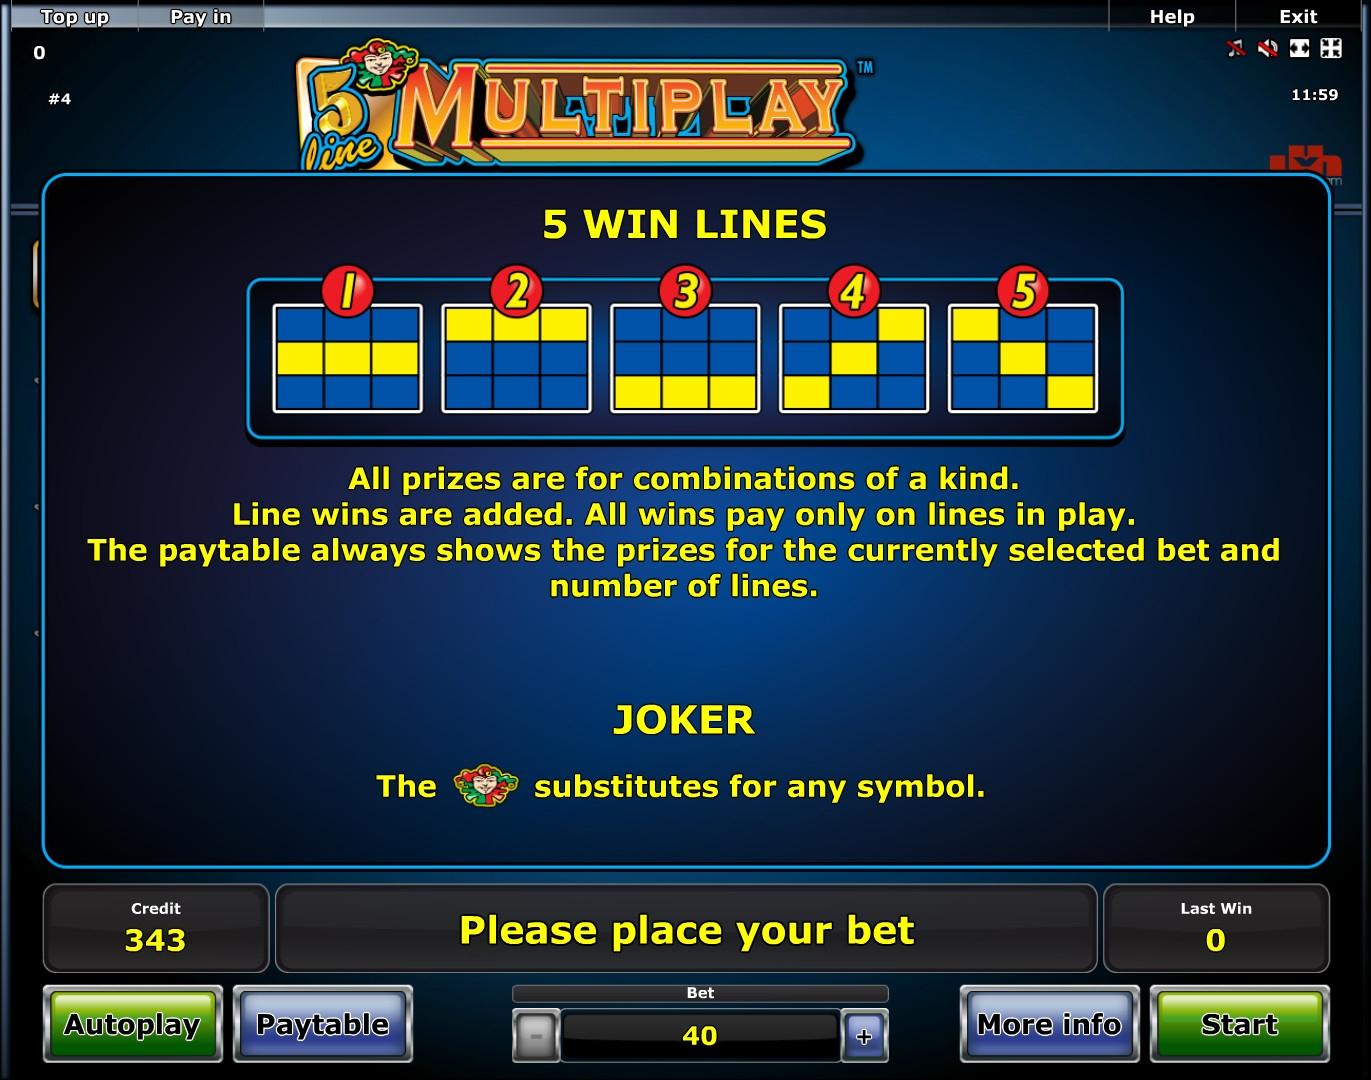 5 line multiplay